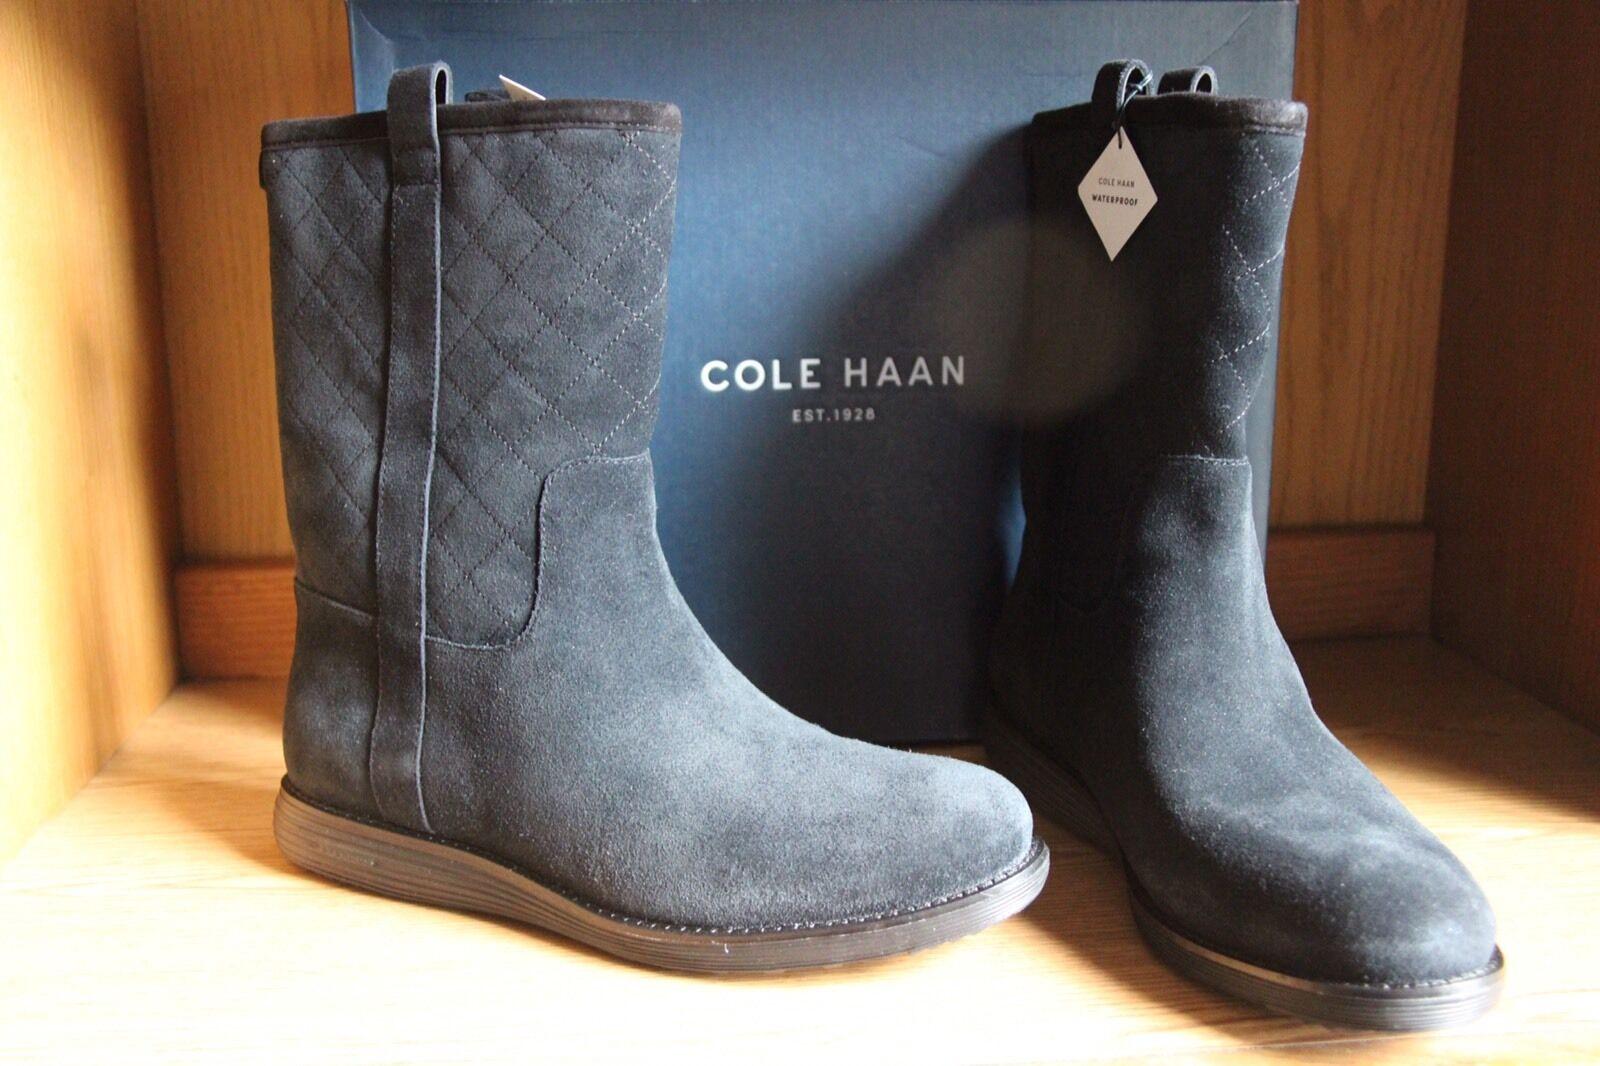 Cole Haan Roper Grand Waterproof Suede Leather Boot Black Women Size 9.5  W04574